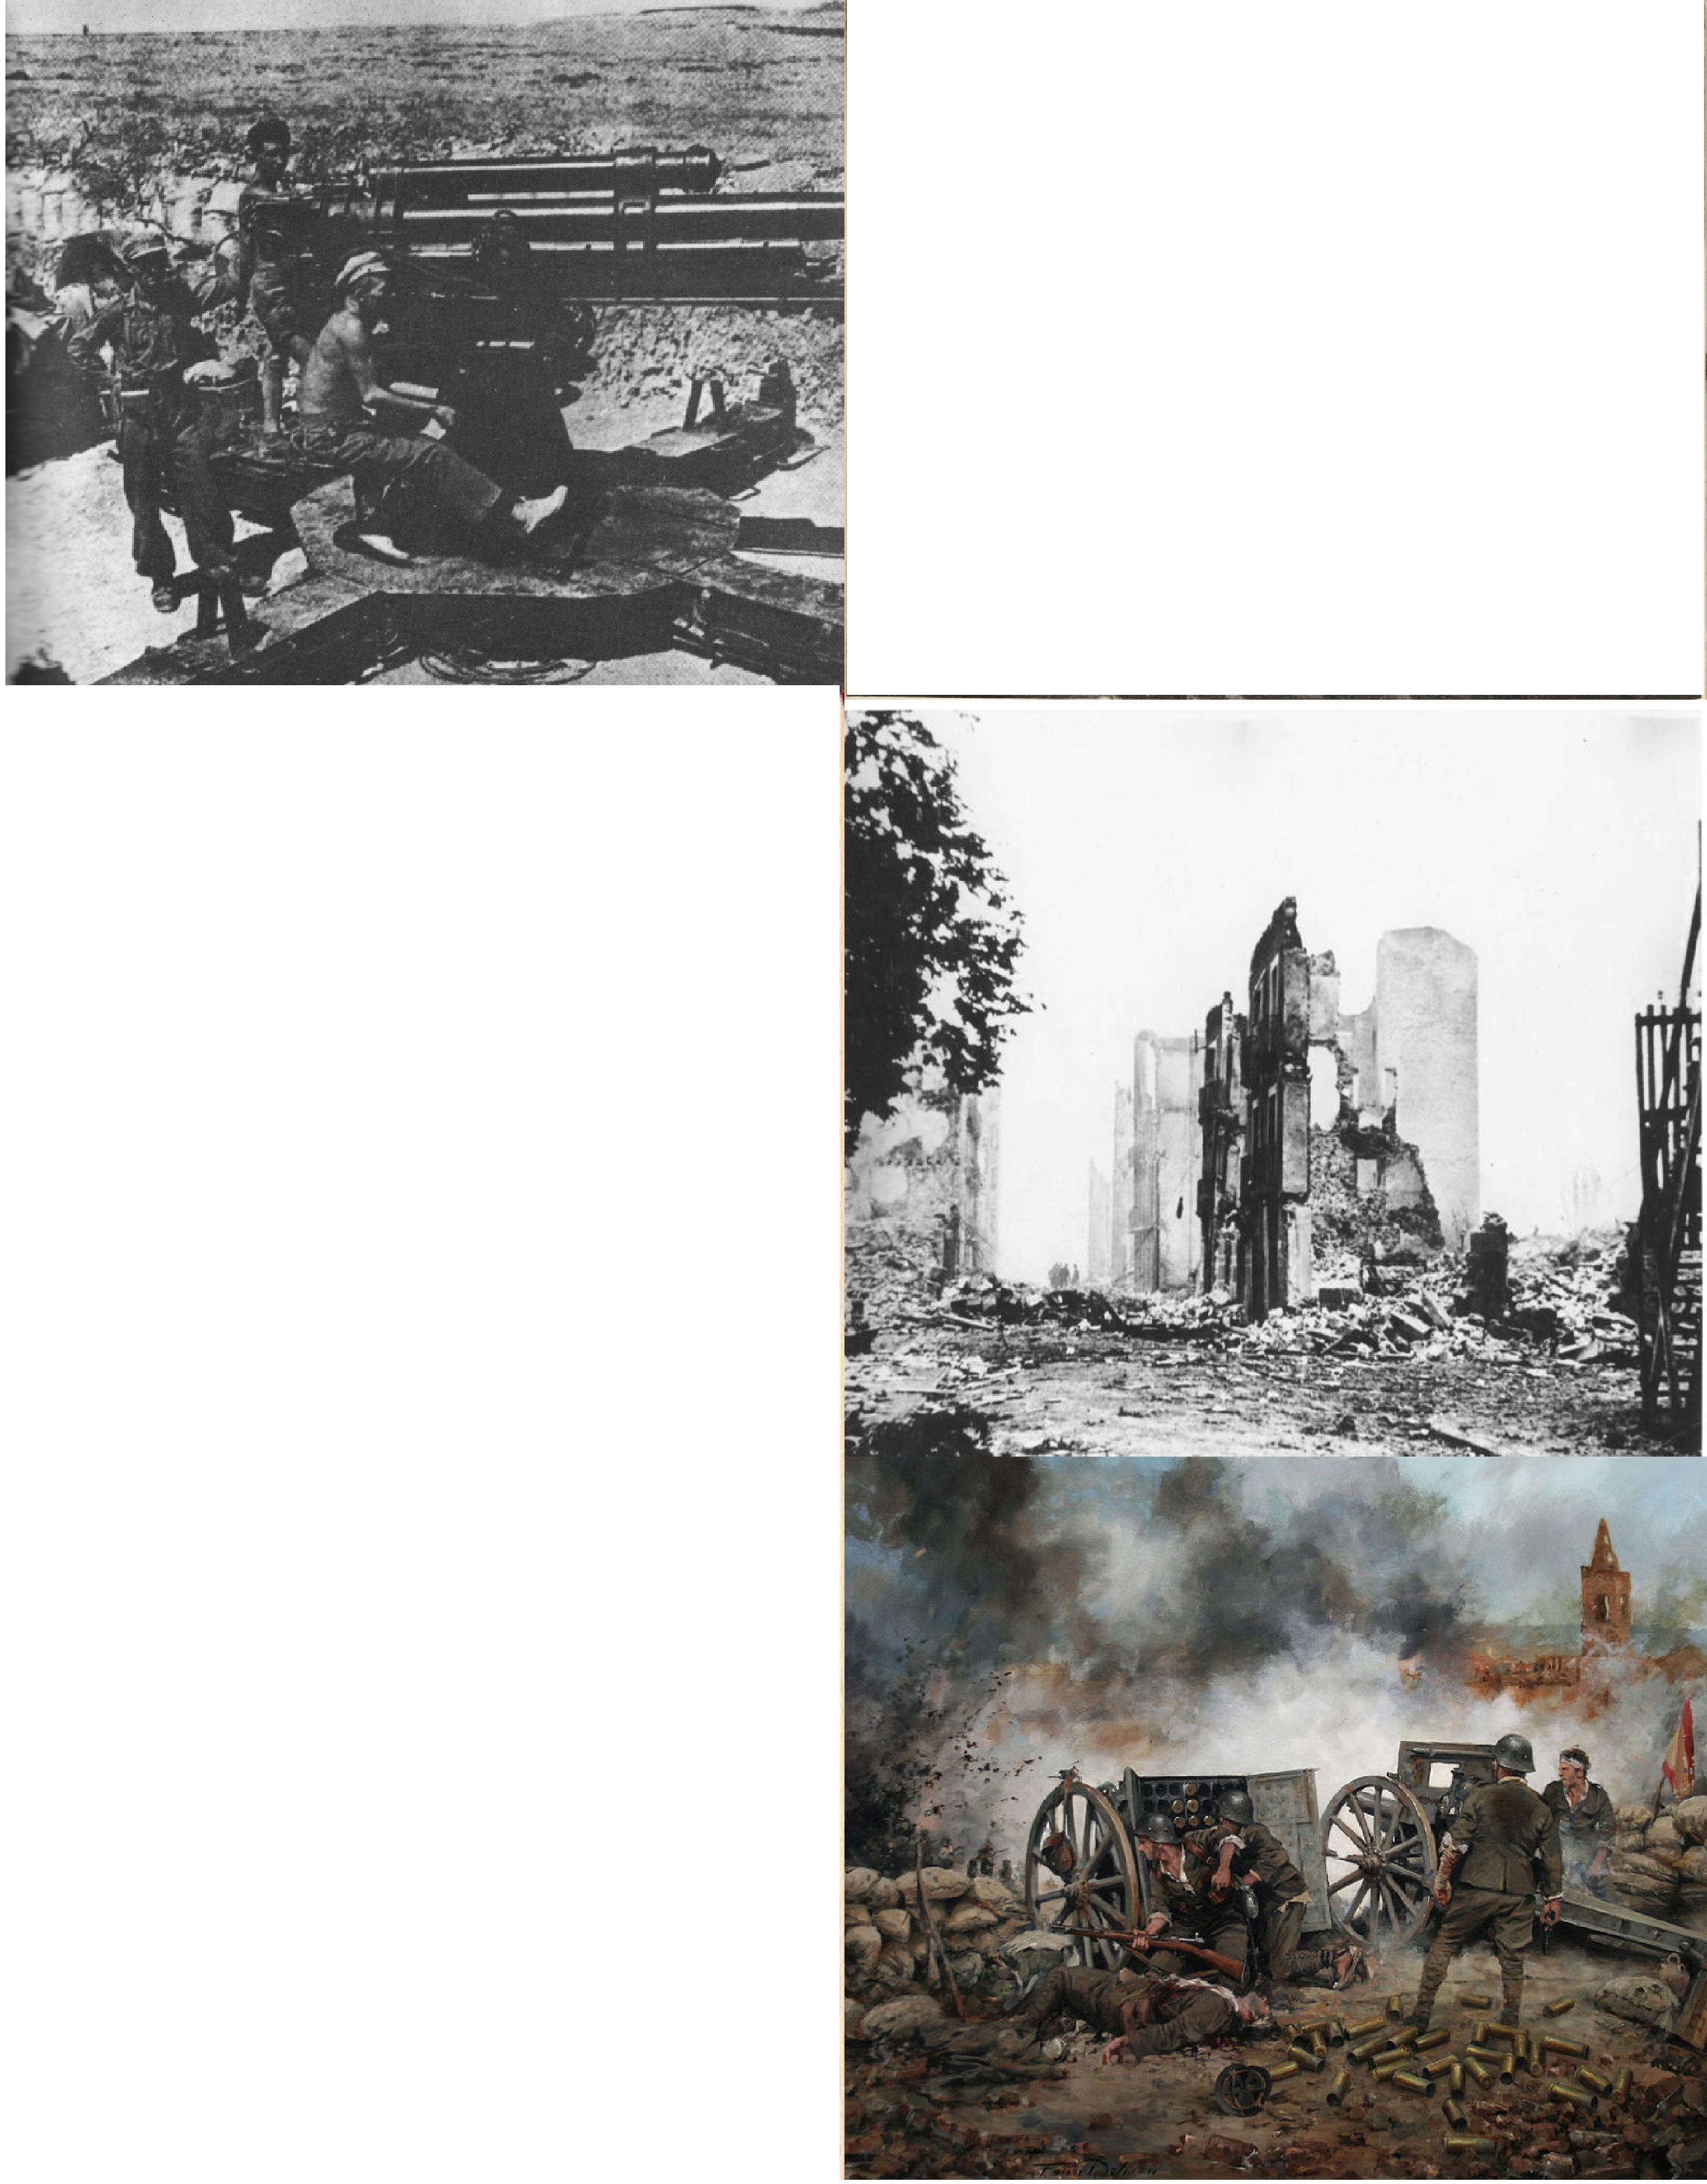 File:Guerra civil española montaje.png - Wikimedia Commons